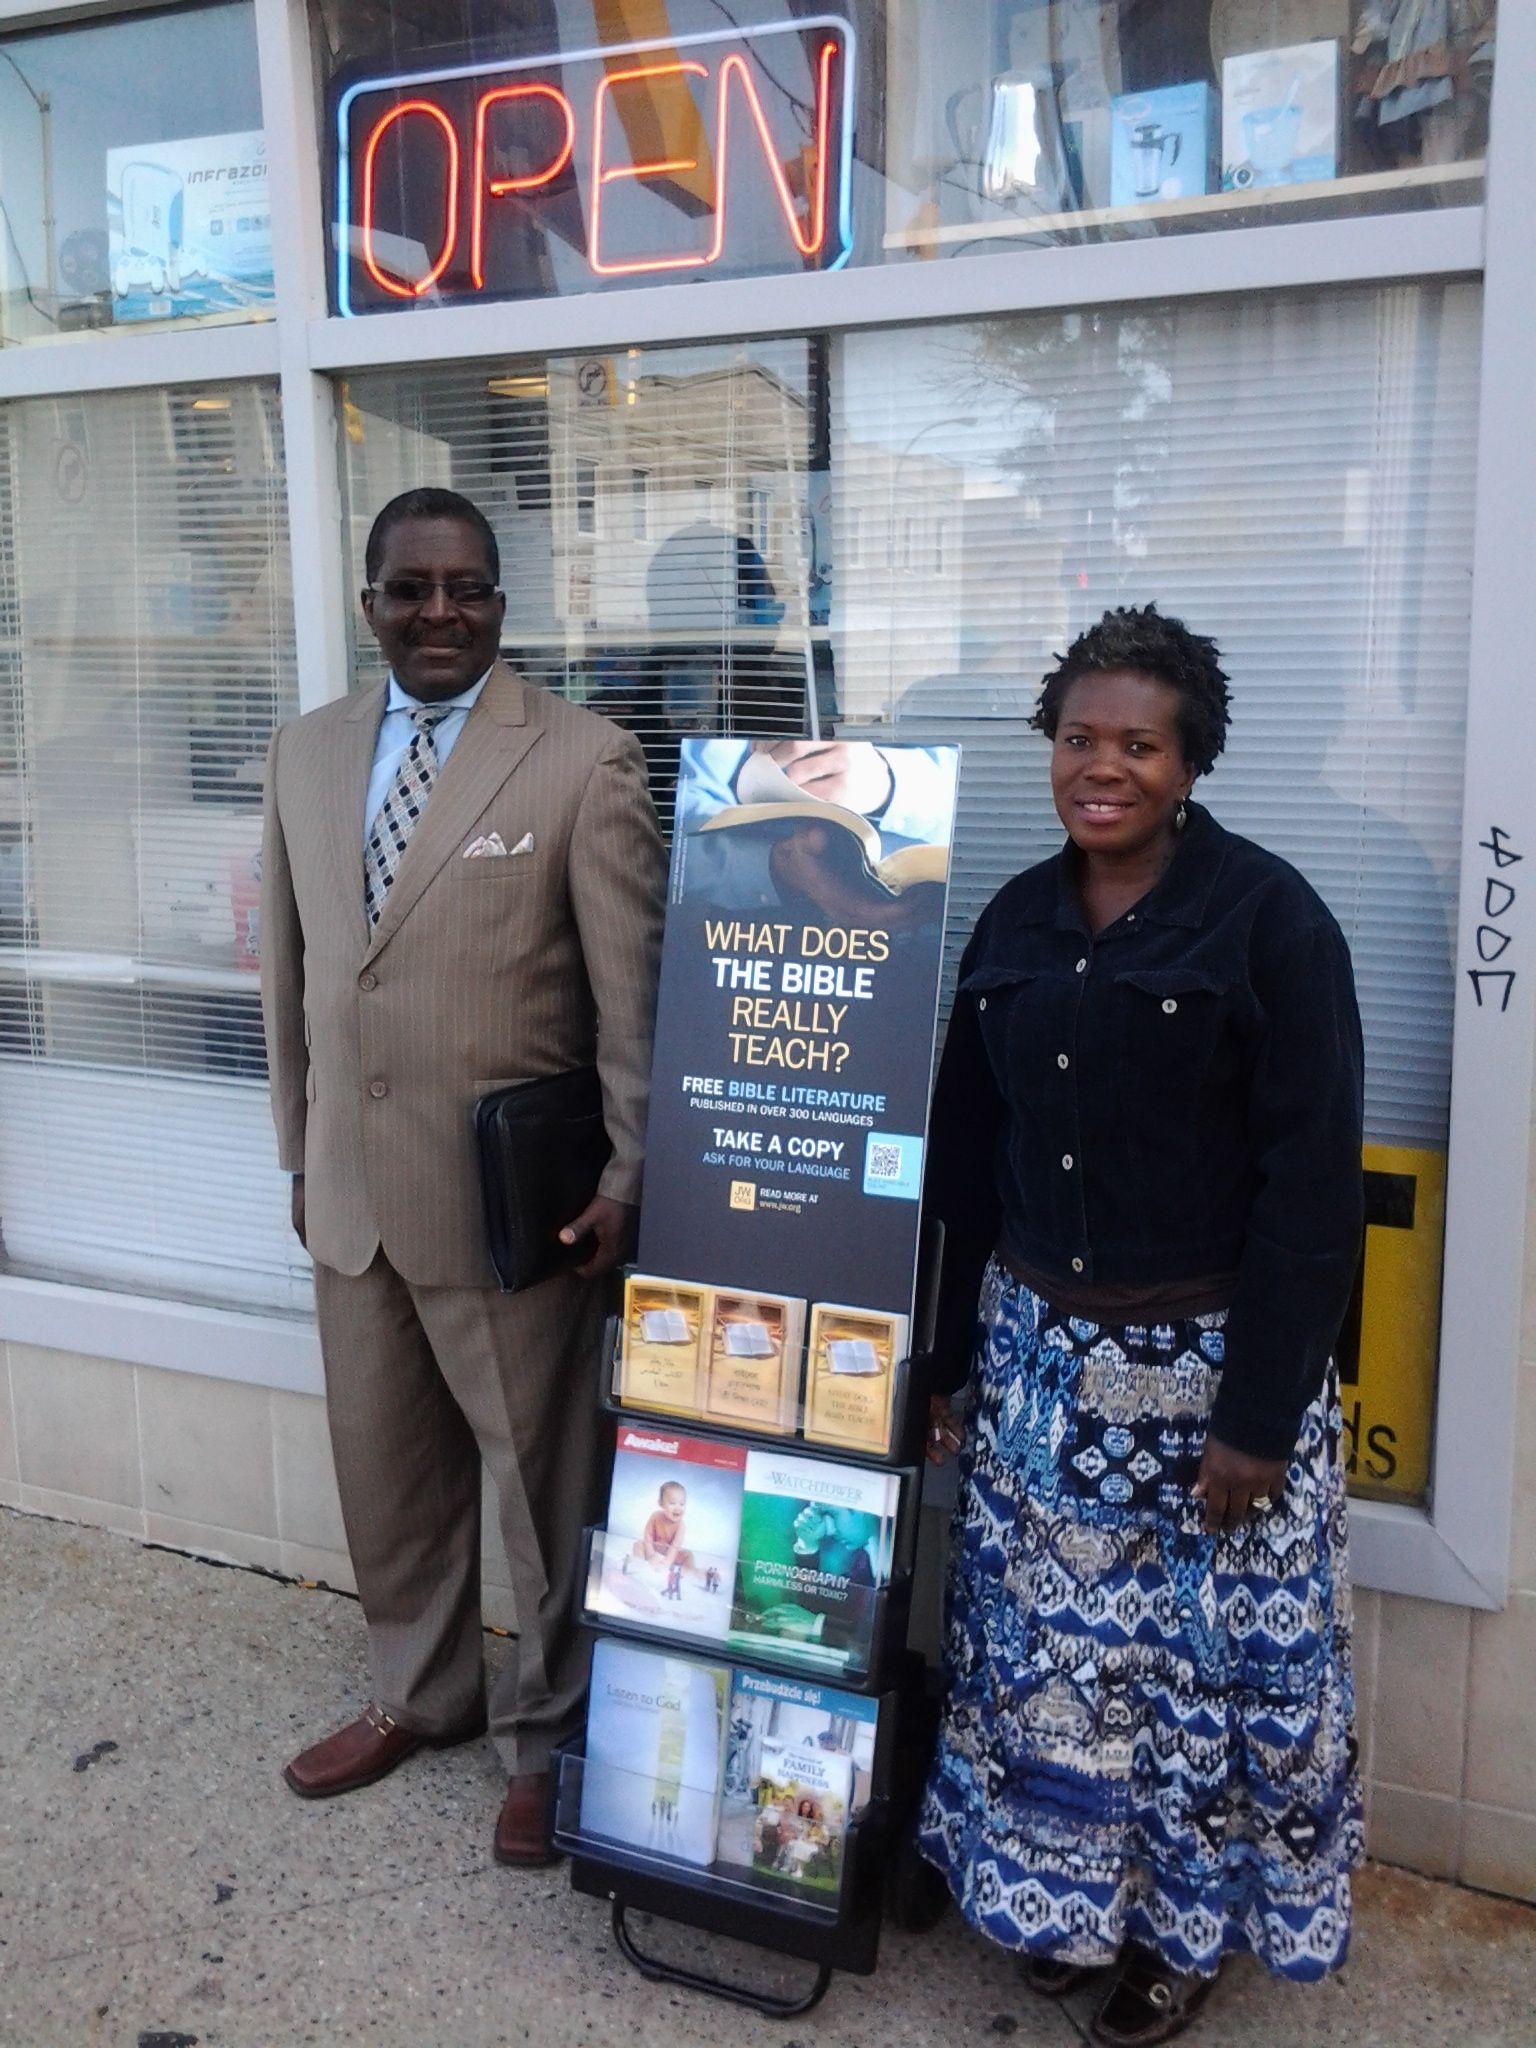 Public Witnessing in Hamtramck | Public Witnessing | Public